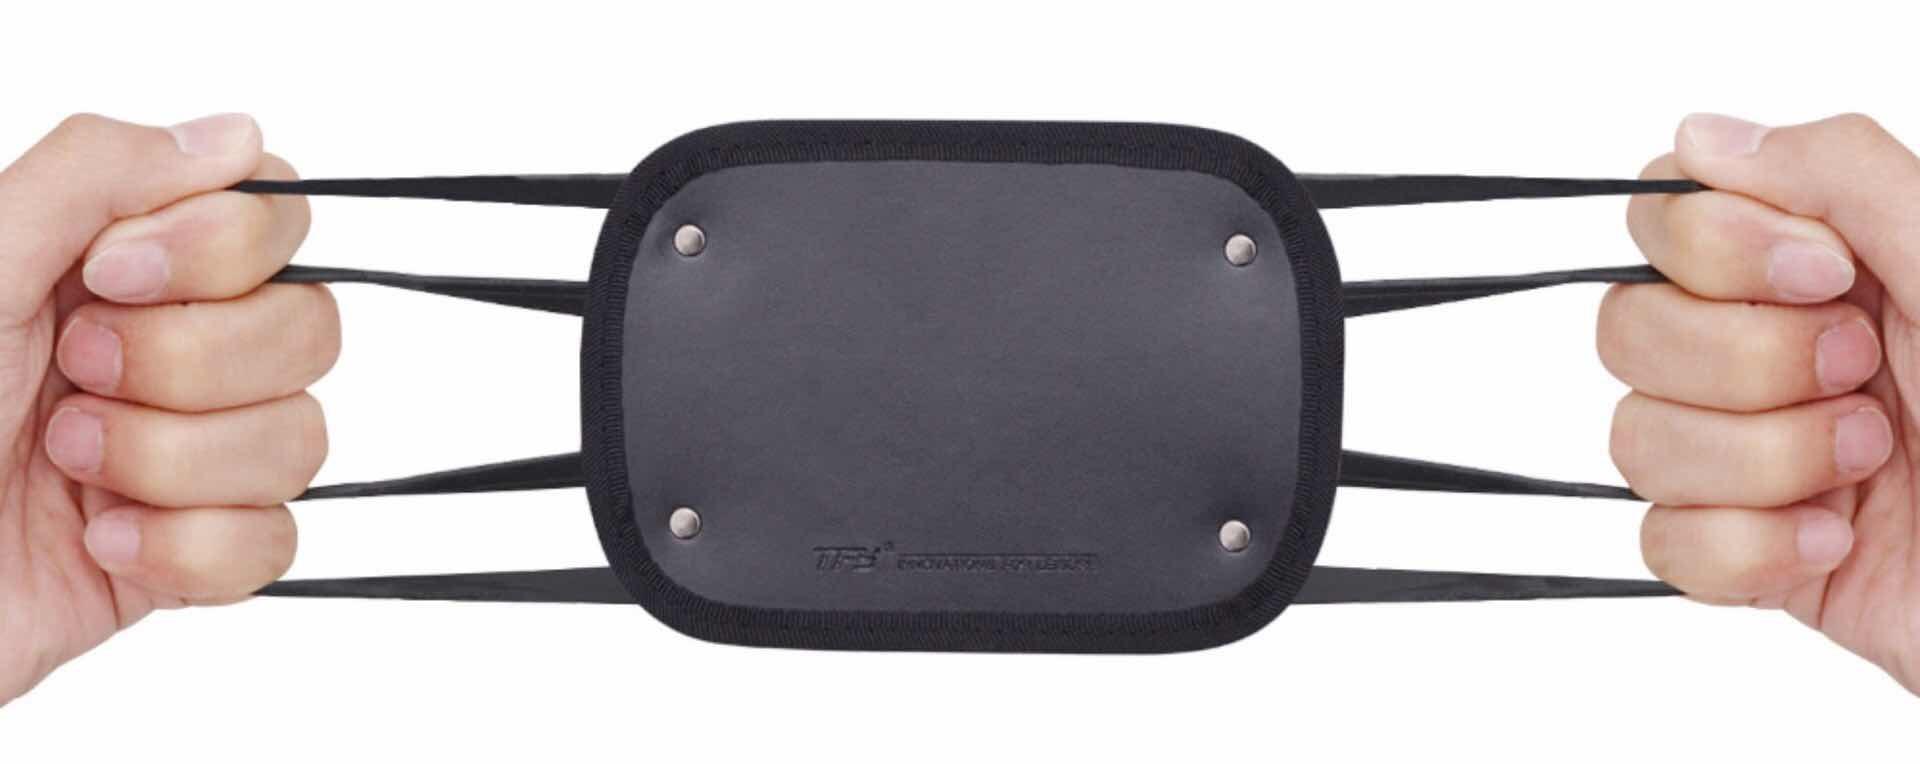 tfy-headrest-mount-for-nintendo-switch-3